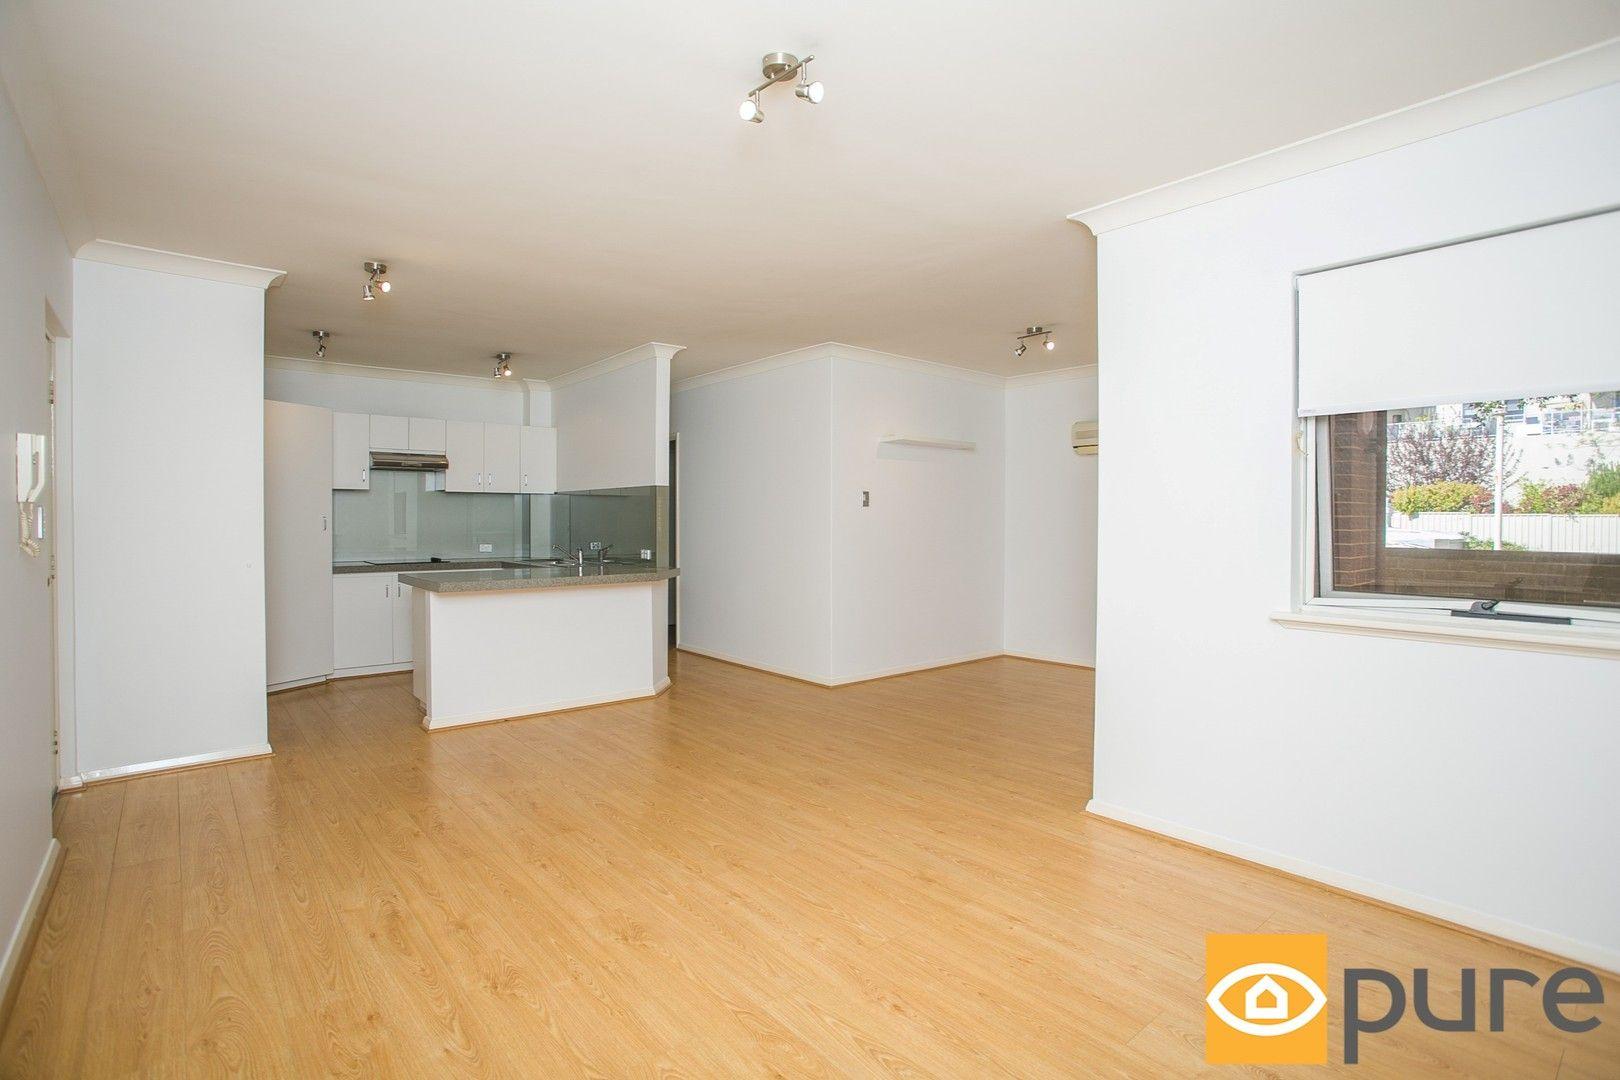 2 bedrooms Apartment / Unit / Flat in 3/55 Wellington Street EAST PERTH WA, 6004